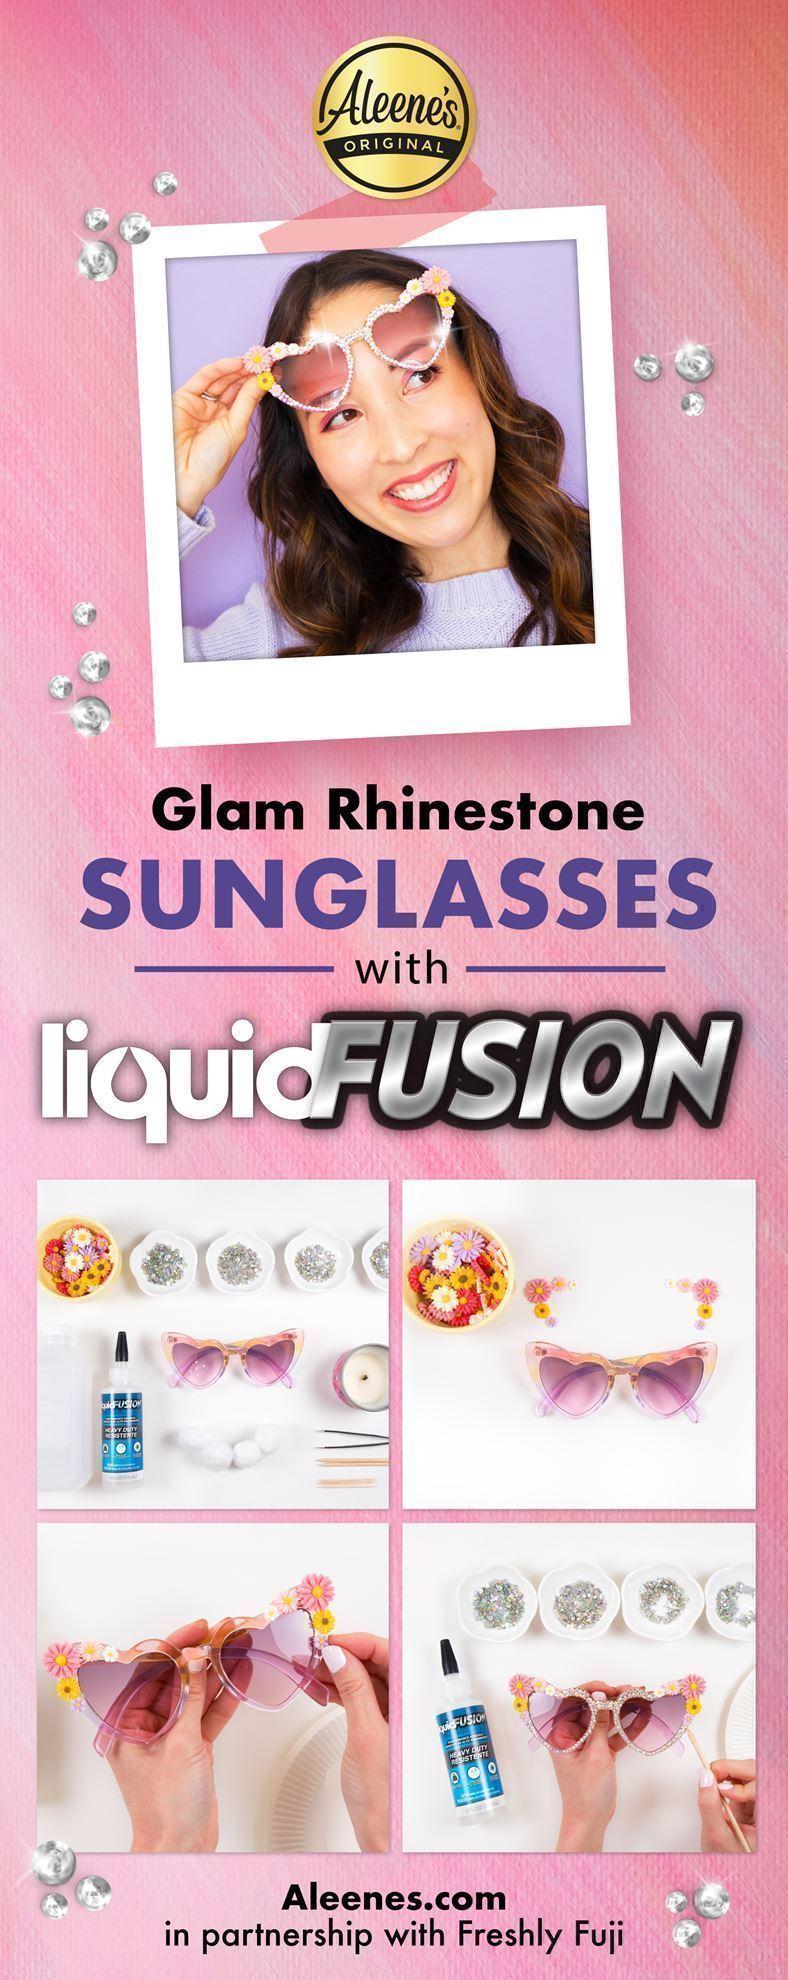 DIY Rhinestone Sunglasses with Liquid Fusion